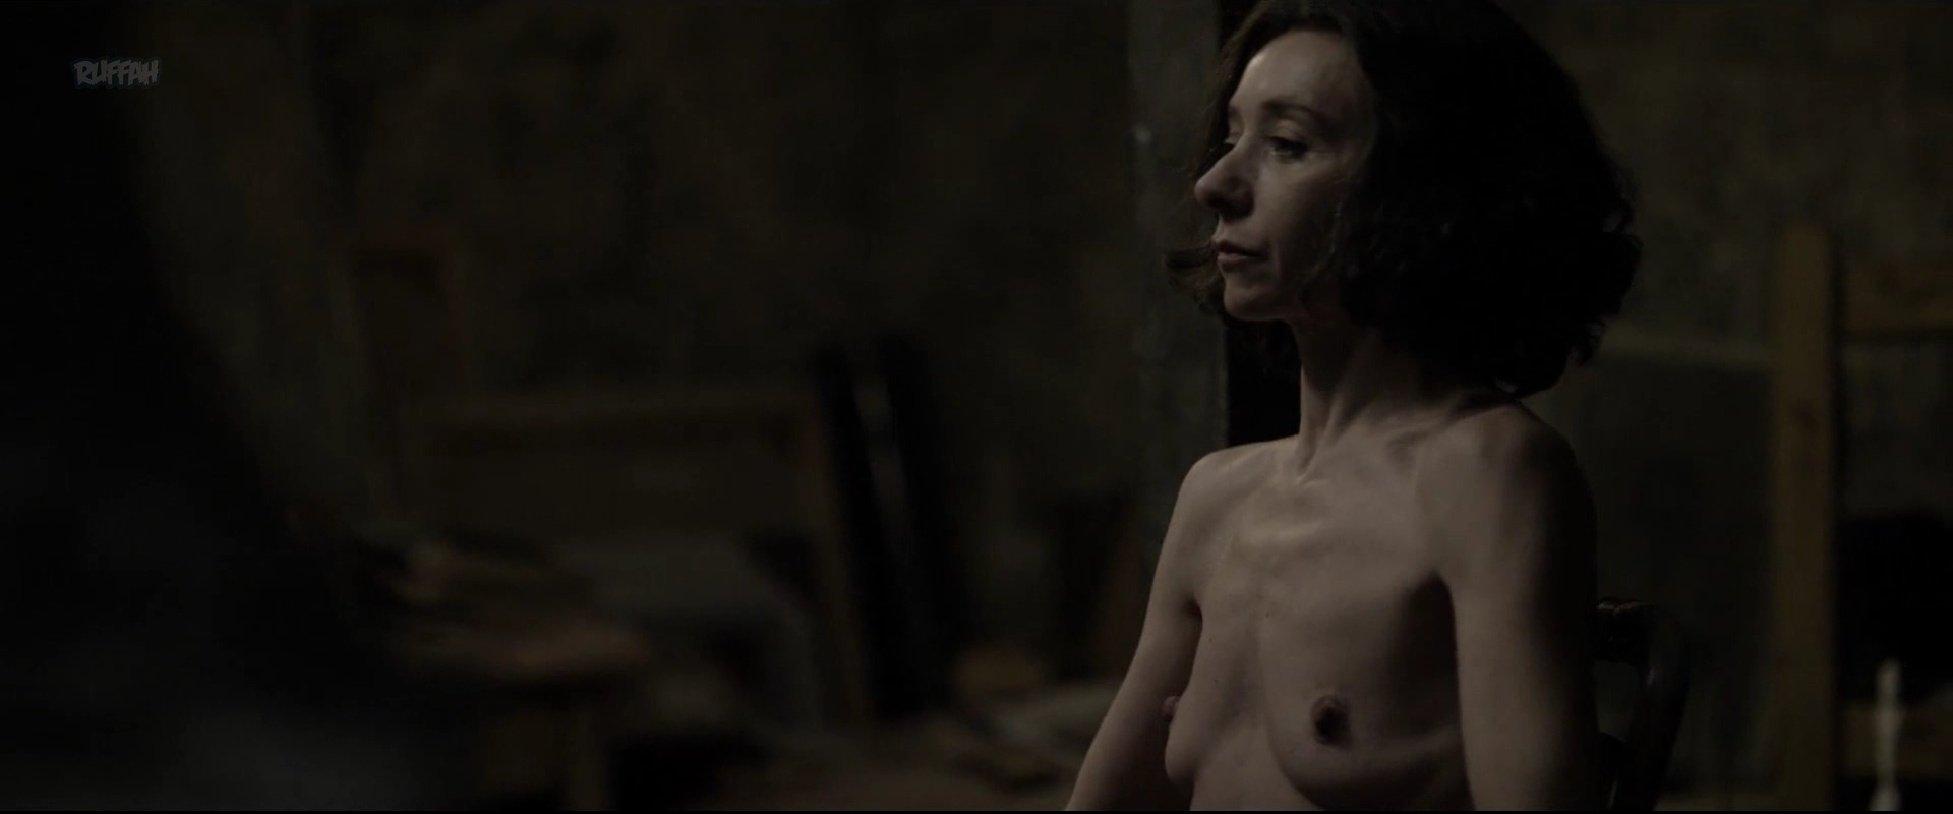 Sylvie Testud nude - Final Portrait (2017)